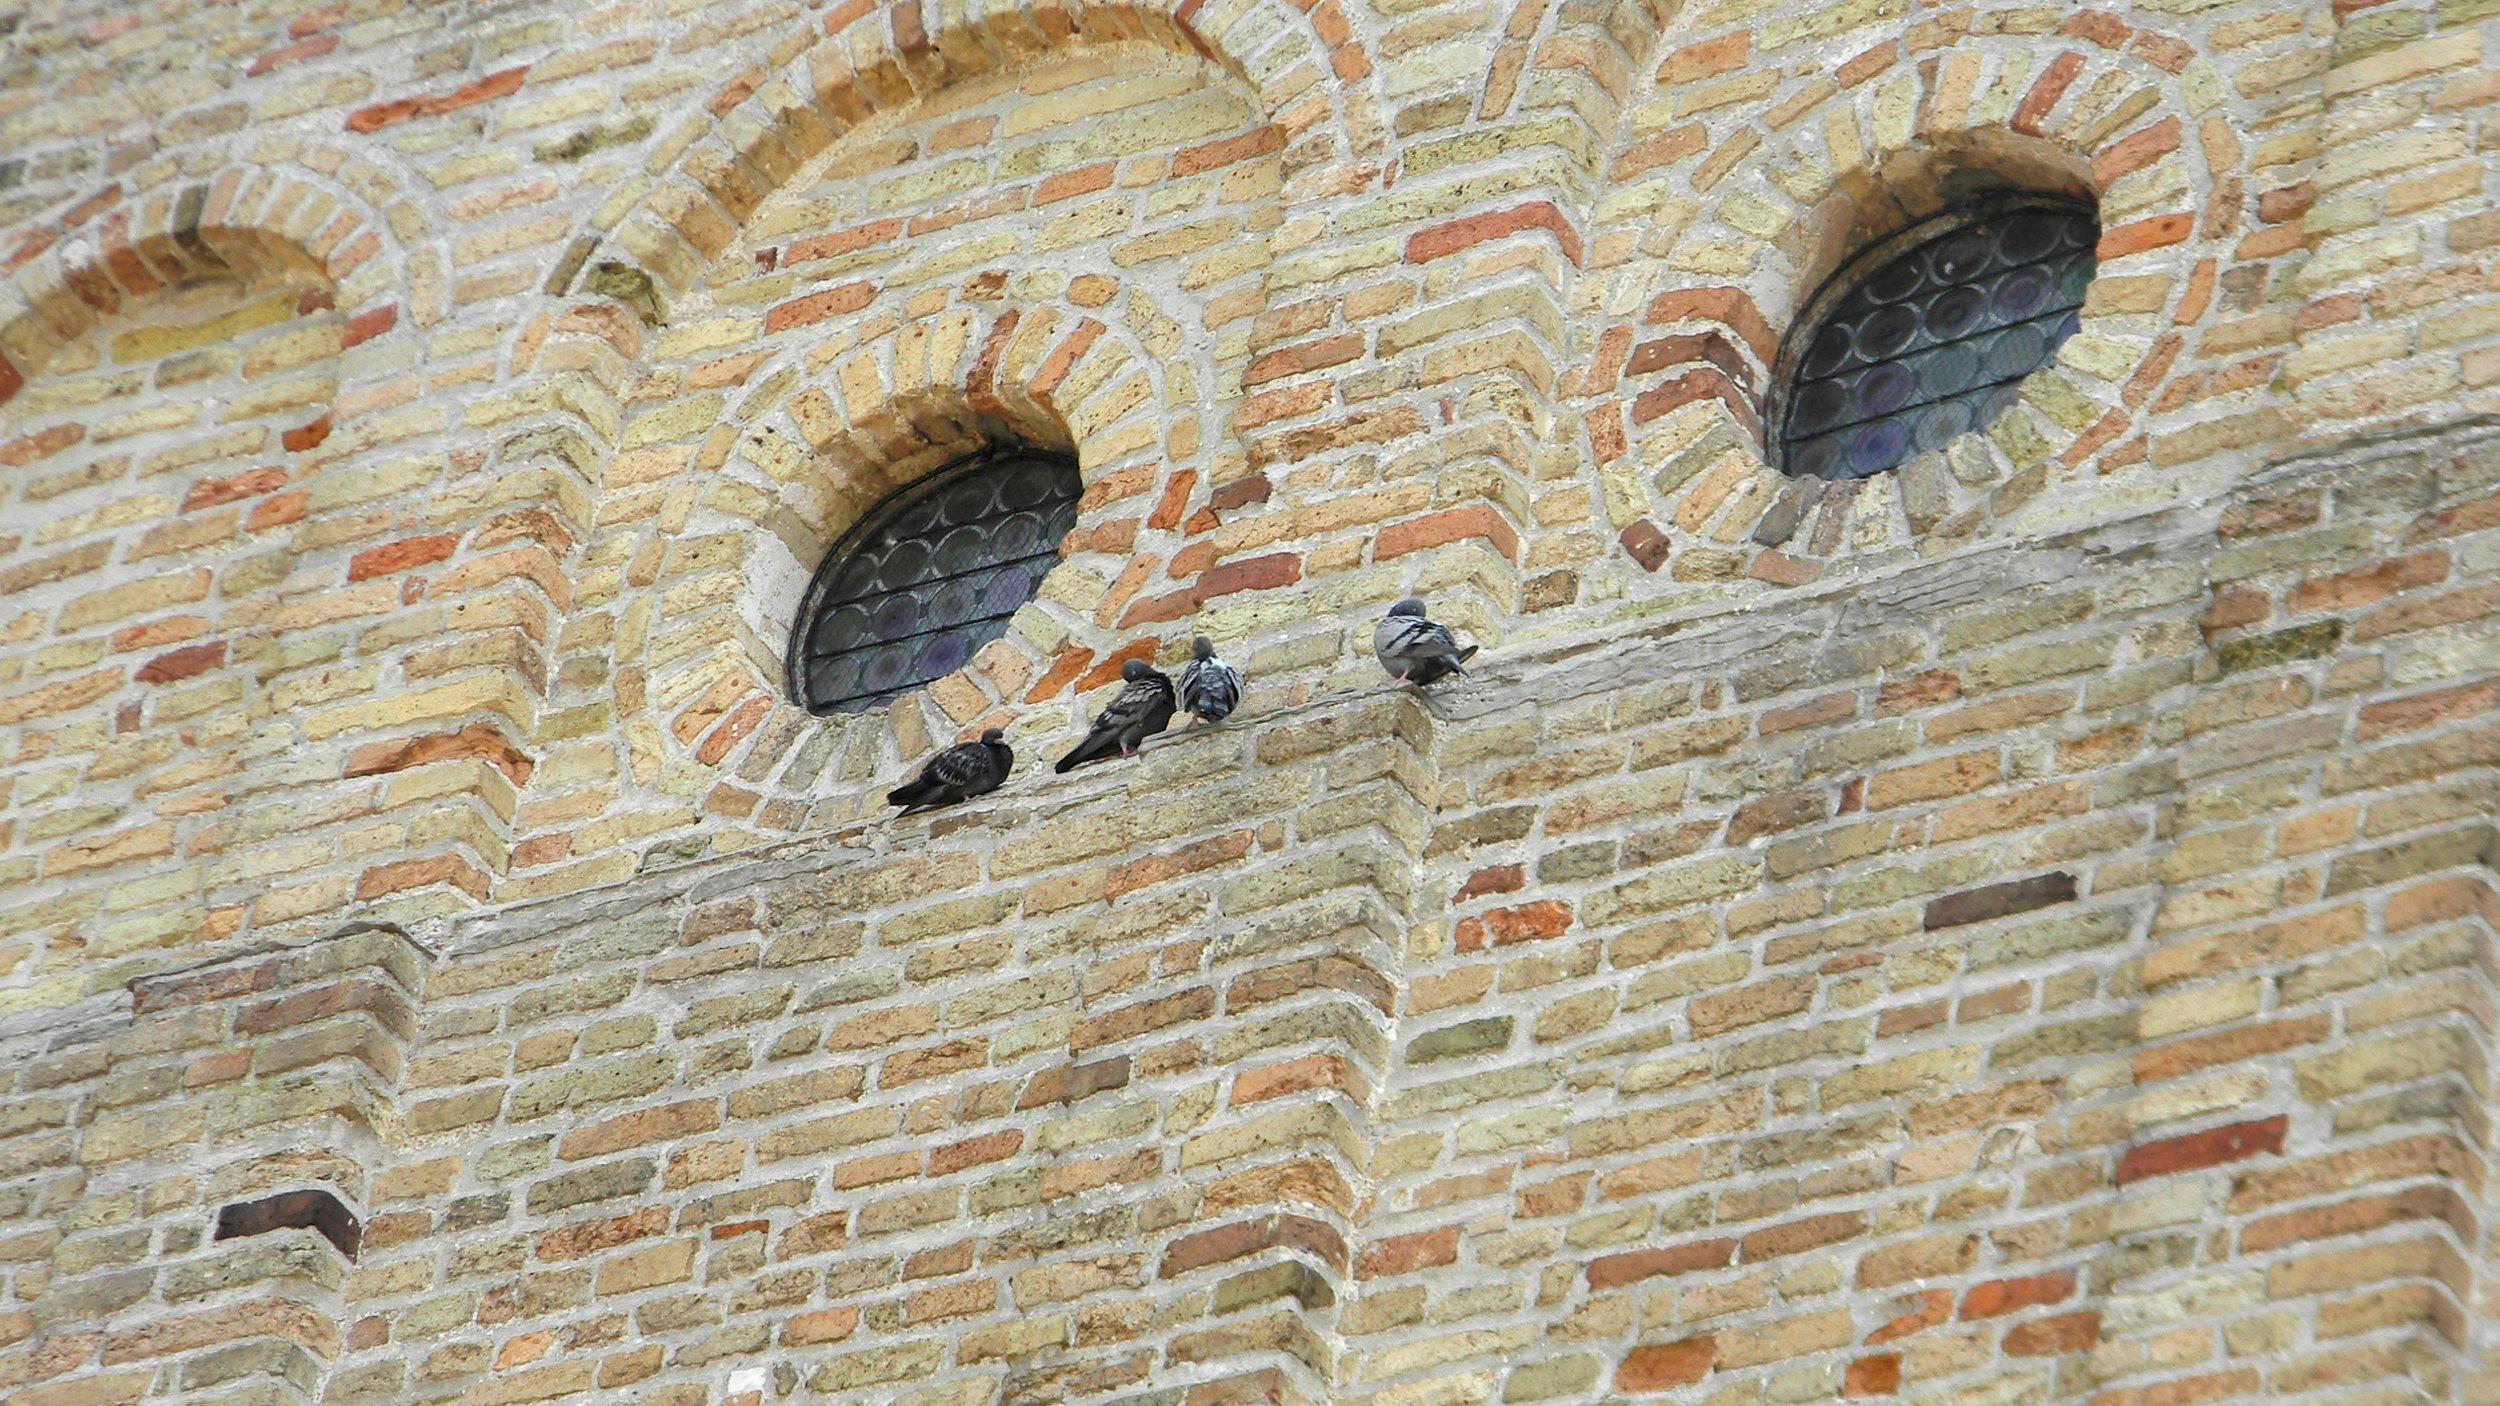 Closeup on the façade of the Basilica di Santa Maria Assunta. Photo by me.